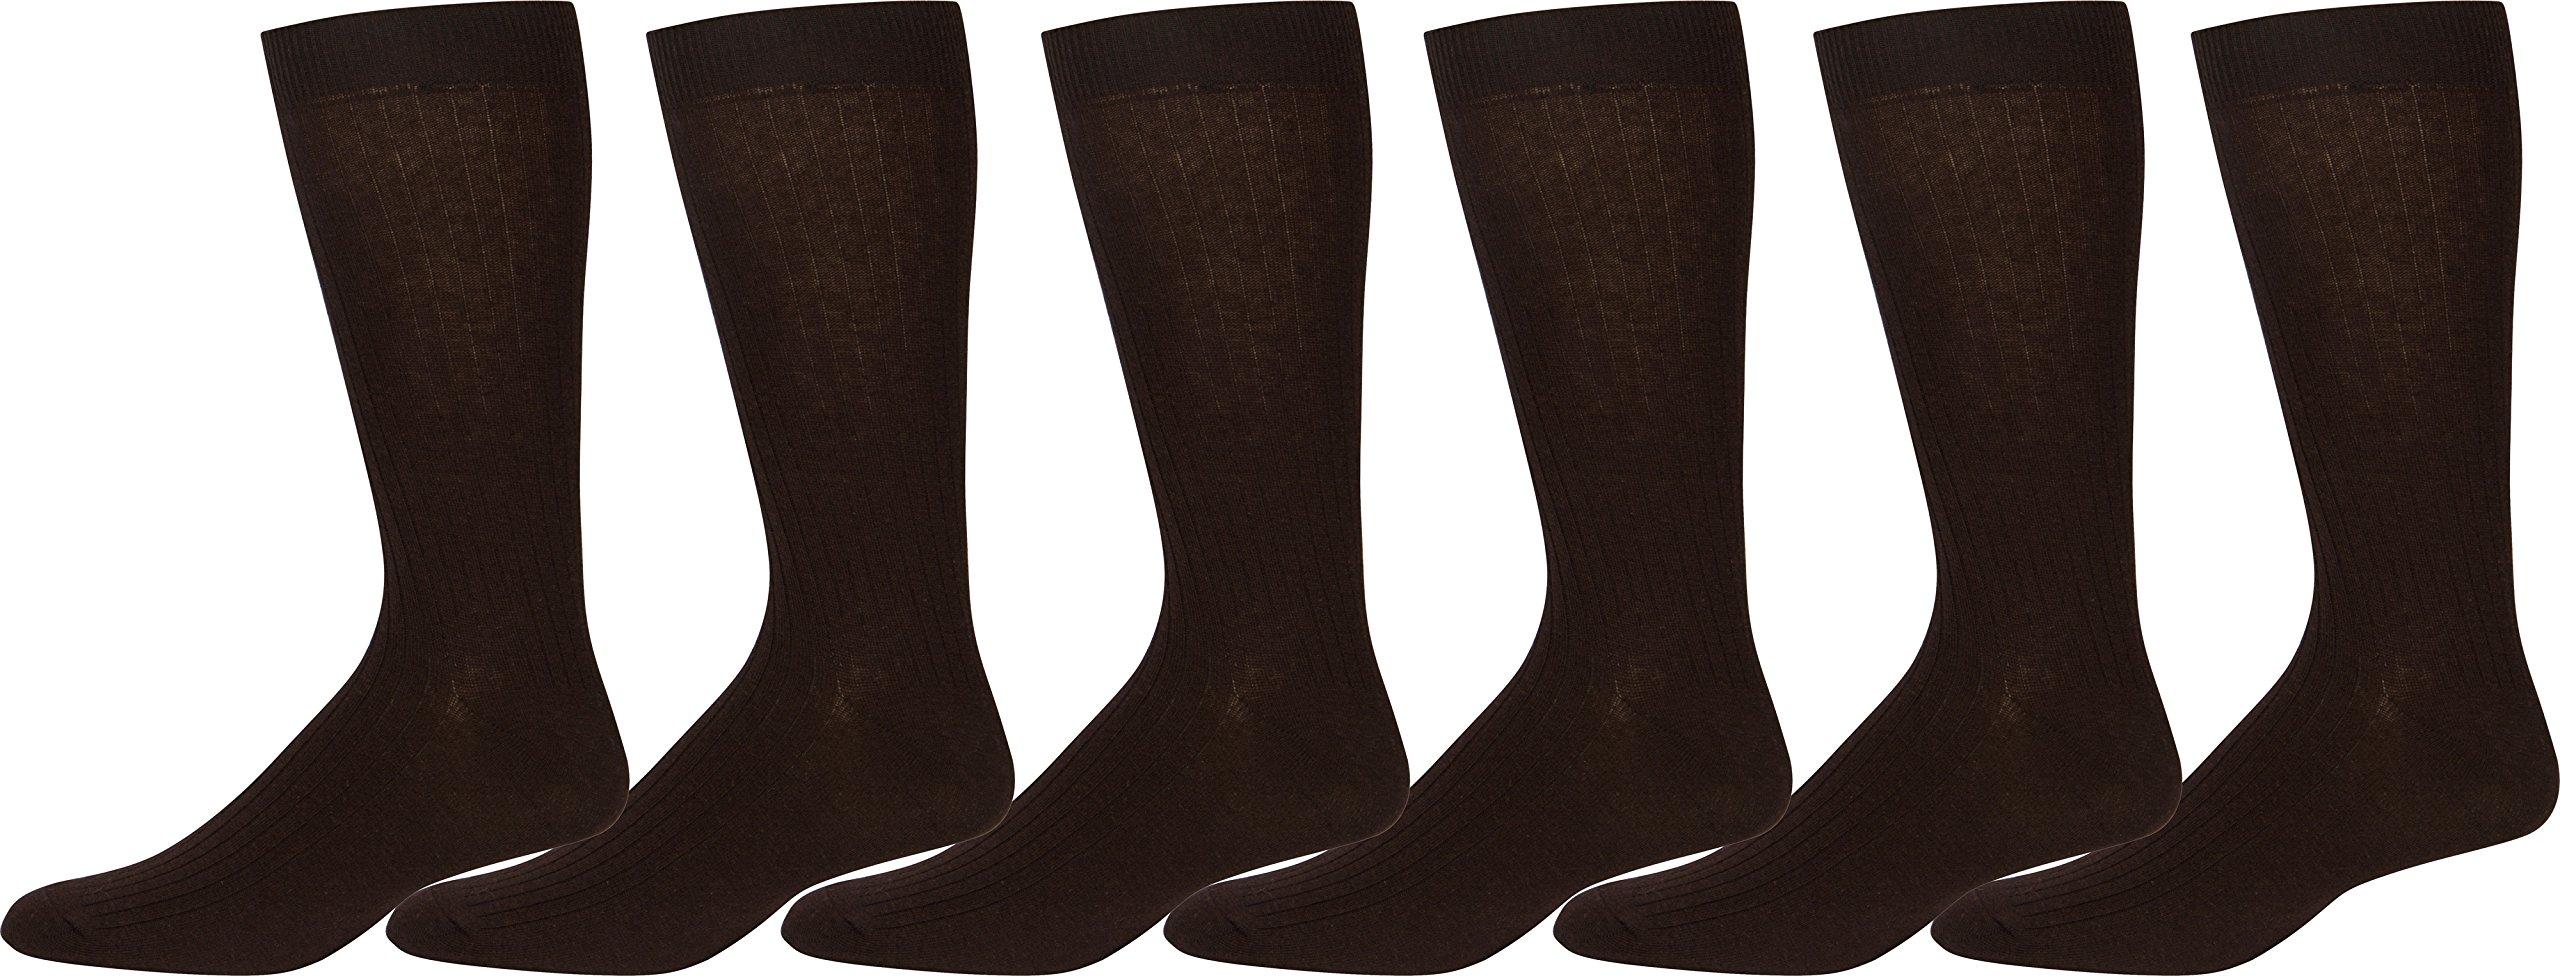 Sakkas Men's Cotton Blend Ribbed Dress Socks, 10-13 - Brown 6 Pack